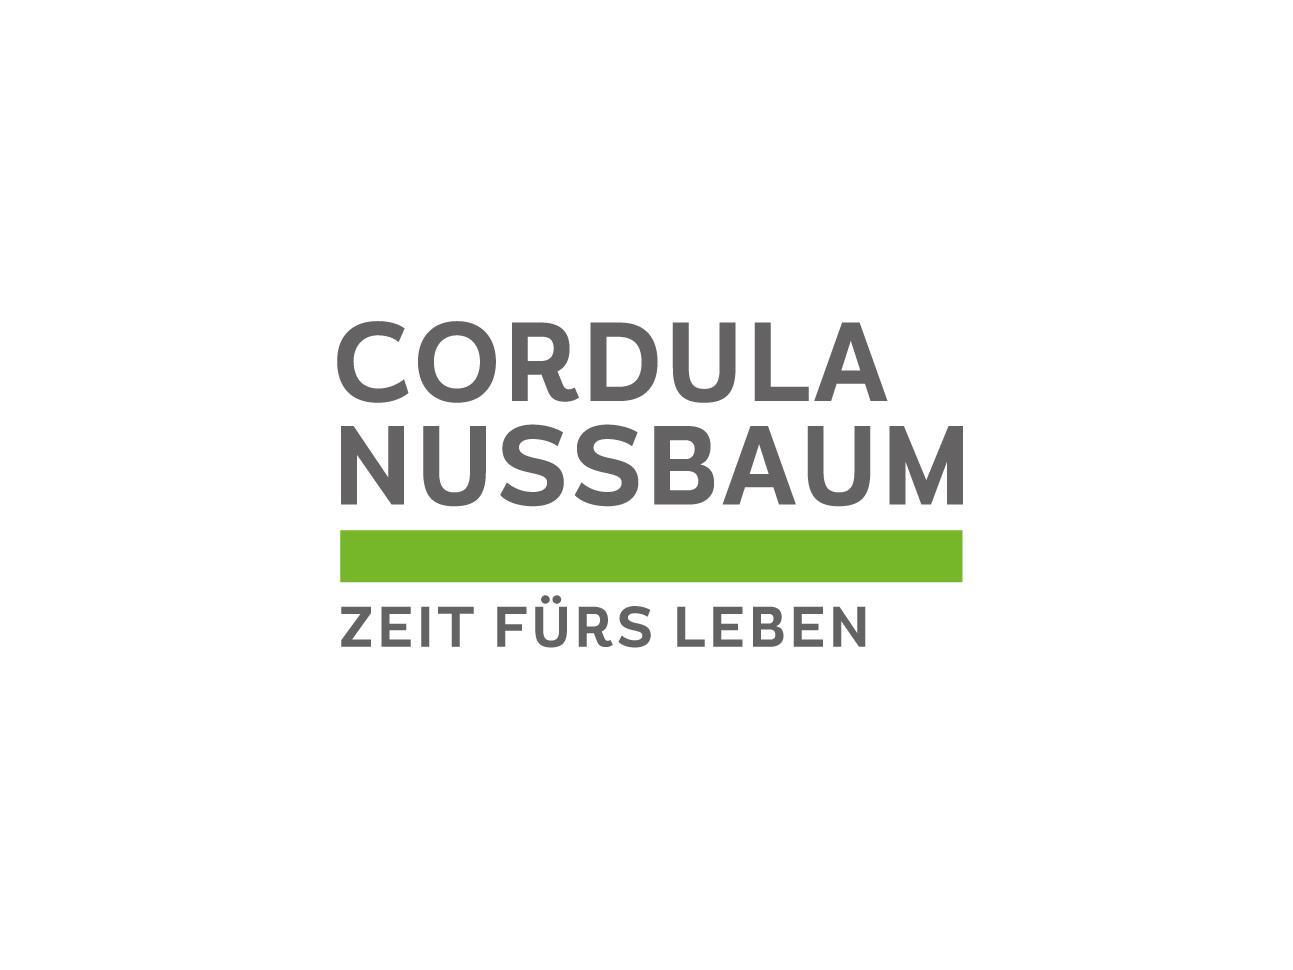 martin_zech_design_corporate_design_cordula_nussbaum_logo